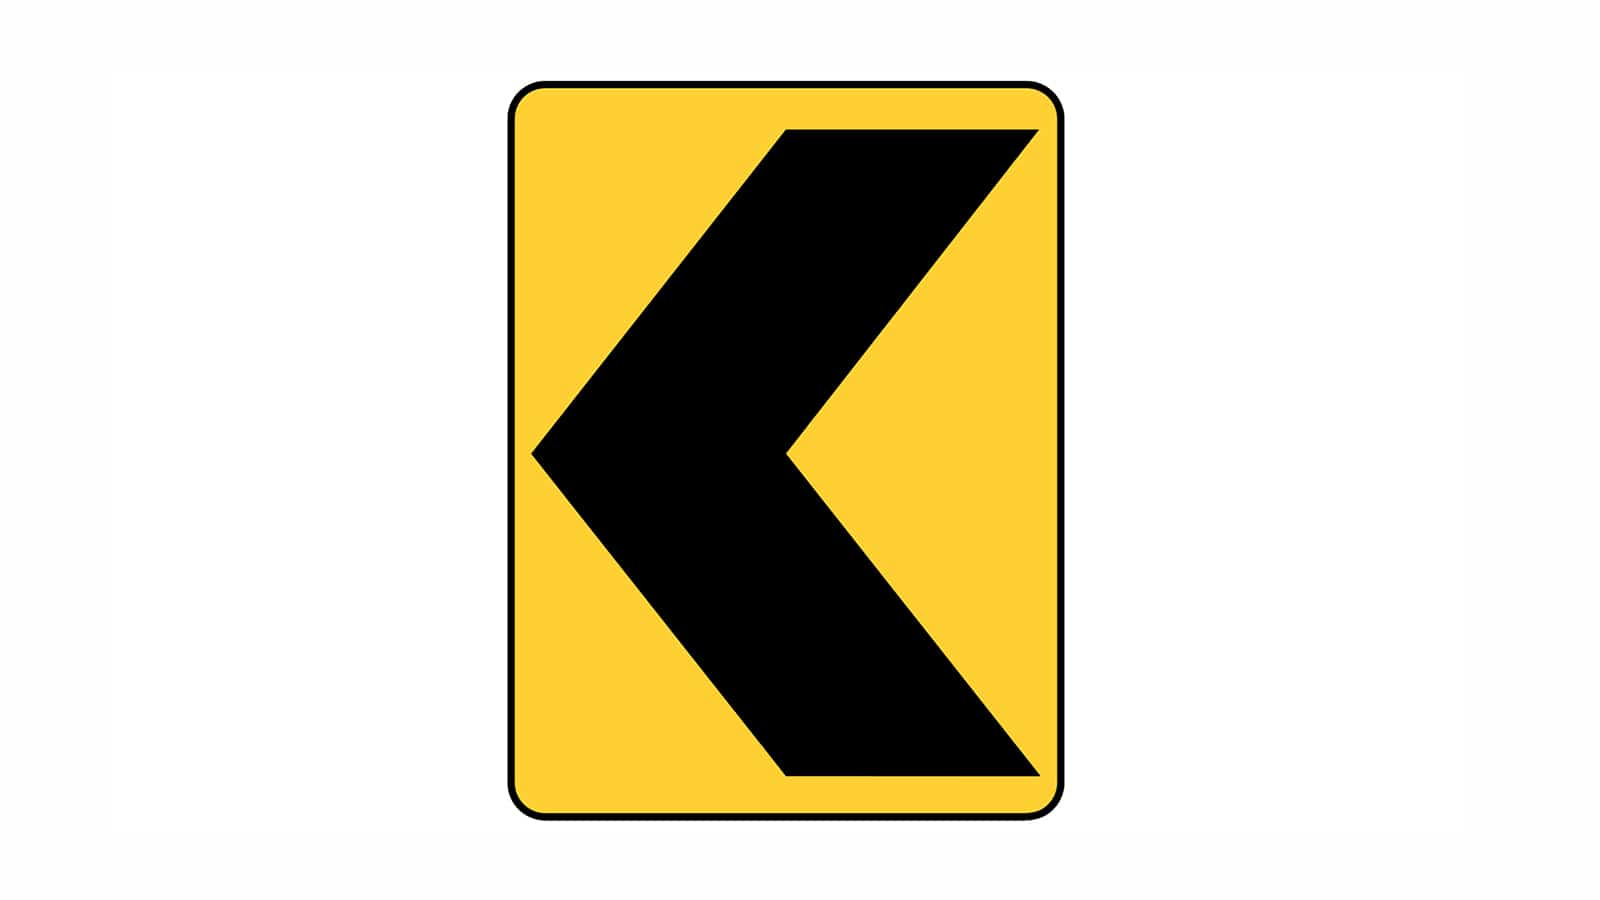 Warning sign Chevron Alignment (Left)